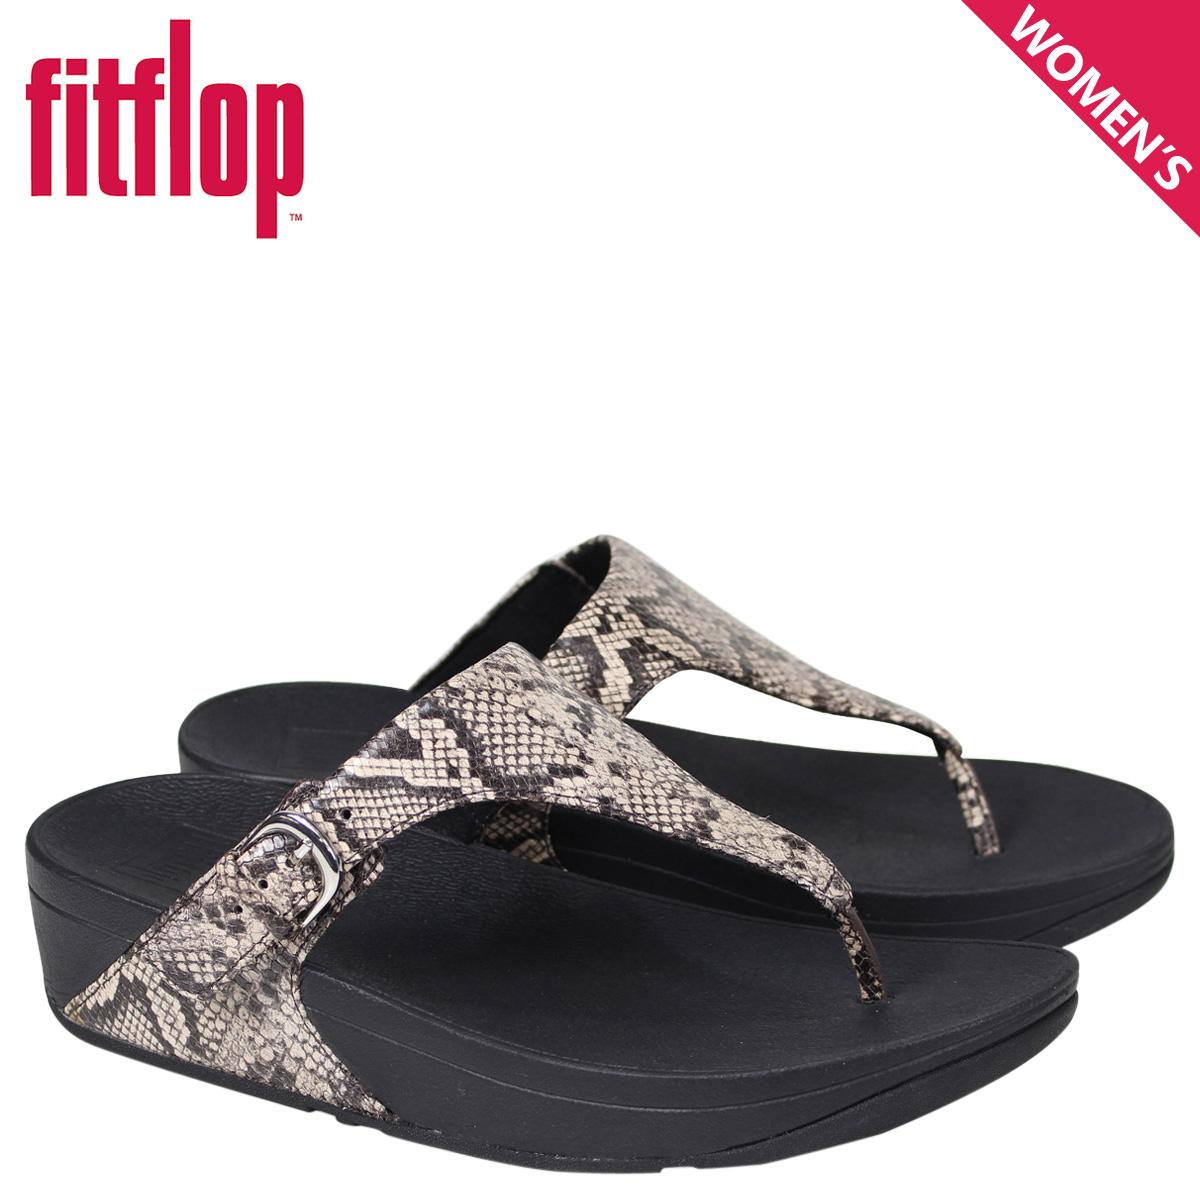 e2d8cde80aa9 SneaK Online Shop  FitFlop sandals fitting FLOPS Kinney SKINNY TOE-THONG  SANDALS SNAKE PRINT LEATHER Lady s L69 black  4 4 Shinnyu load